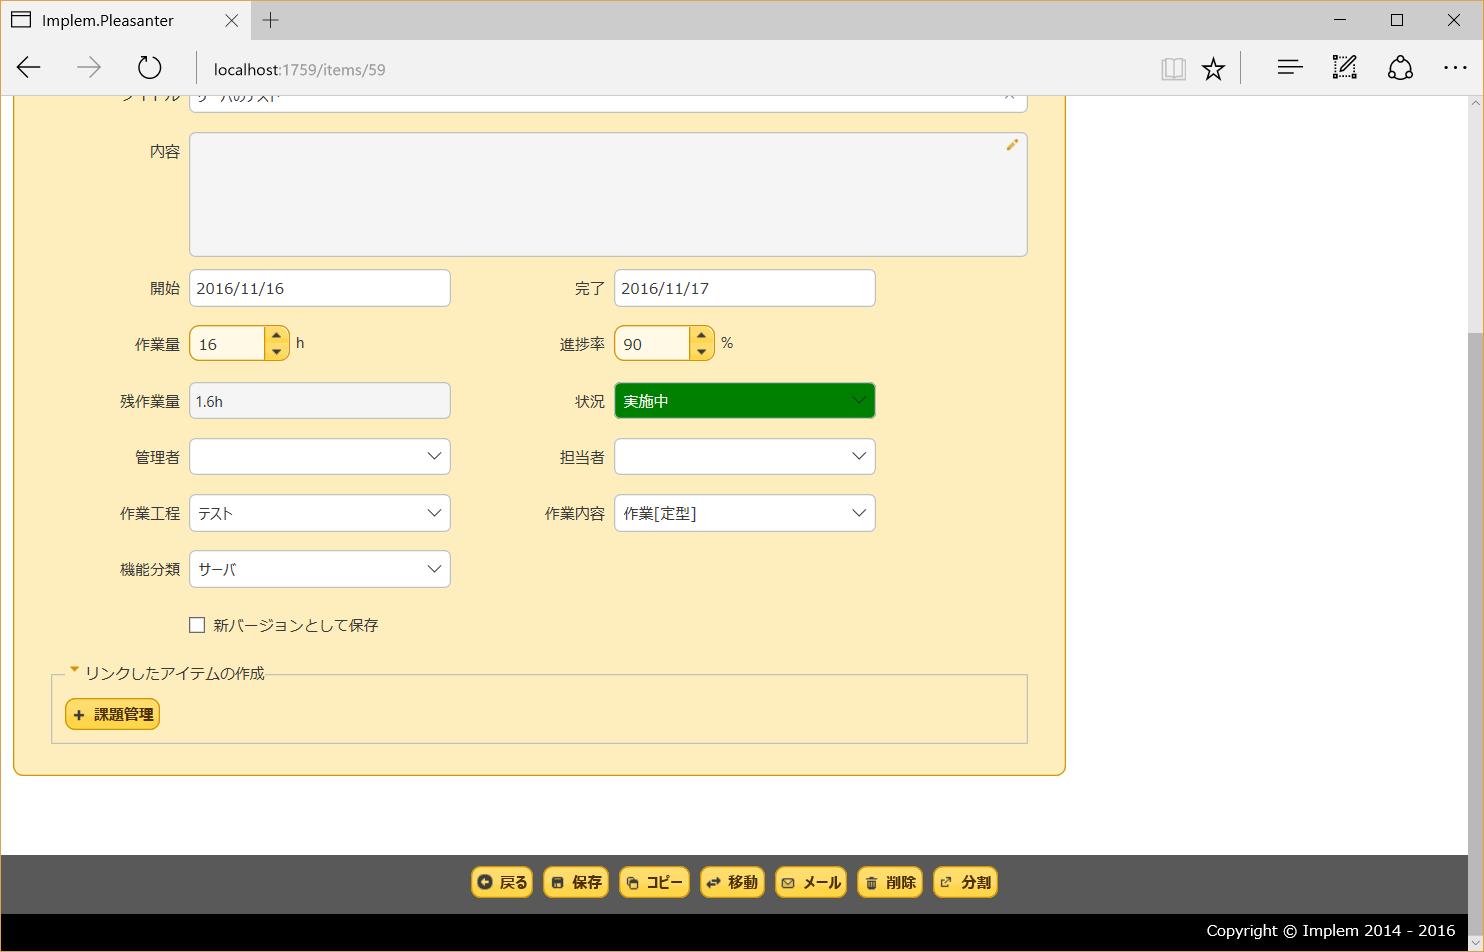 WBSにリンクした課題作成時の画面イメージ